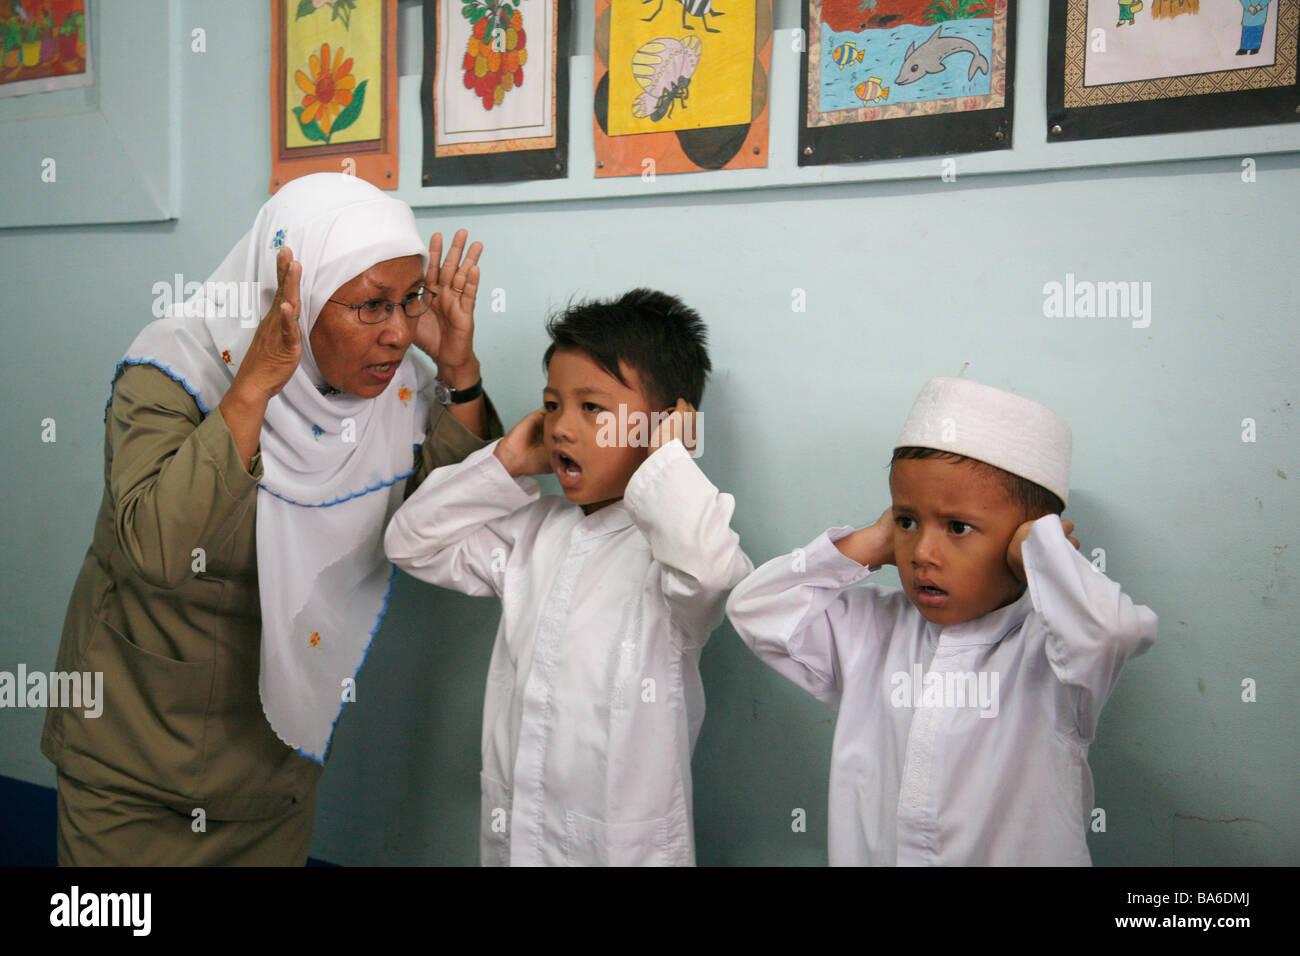 Painet jm0208 indonesia muslim boys taught pray kindergarten banda aceh lost many its children tsunami rebuilt school Stock Photo